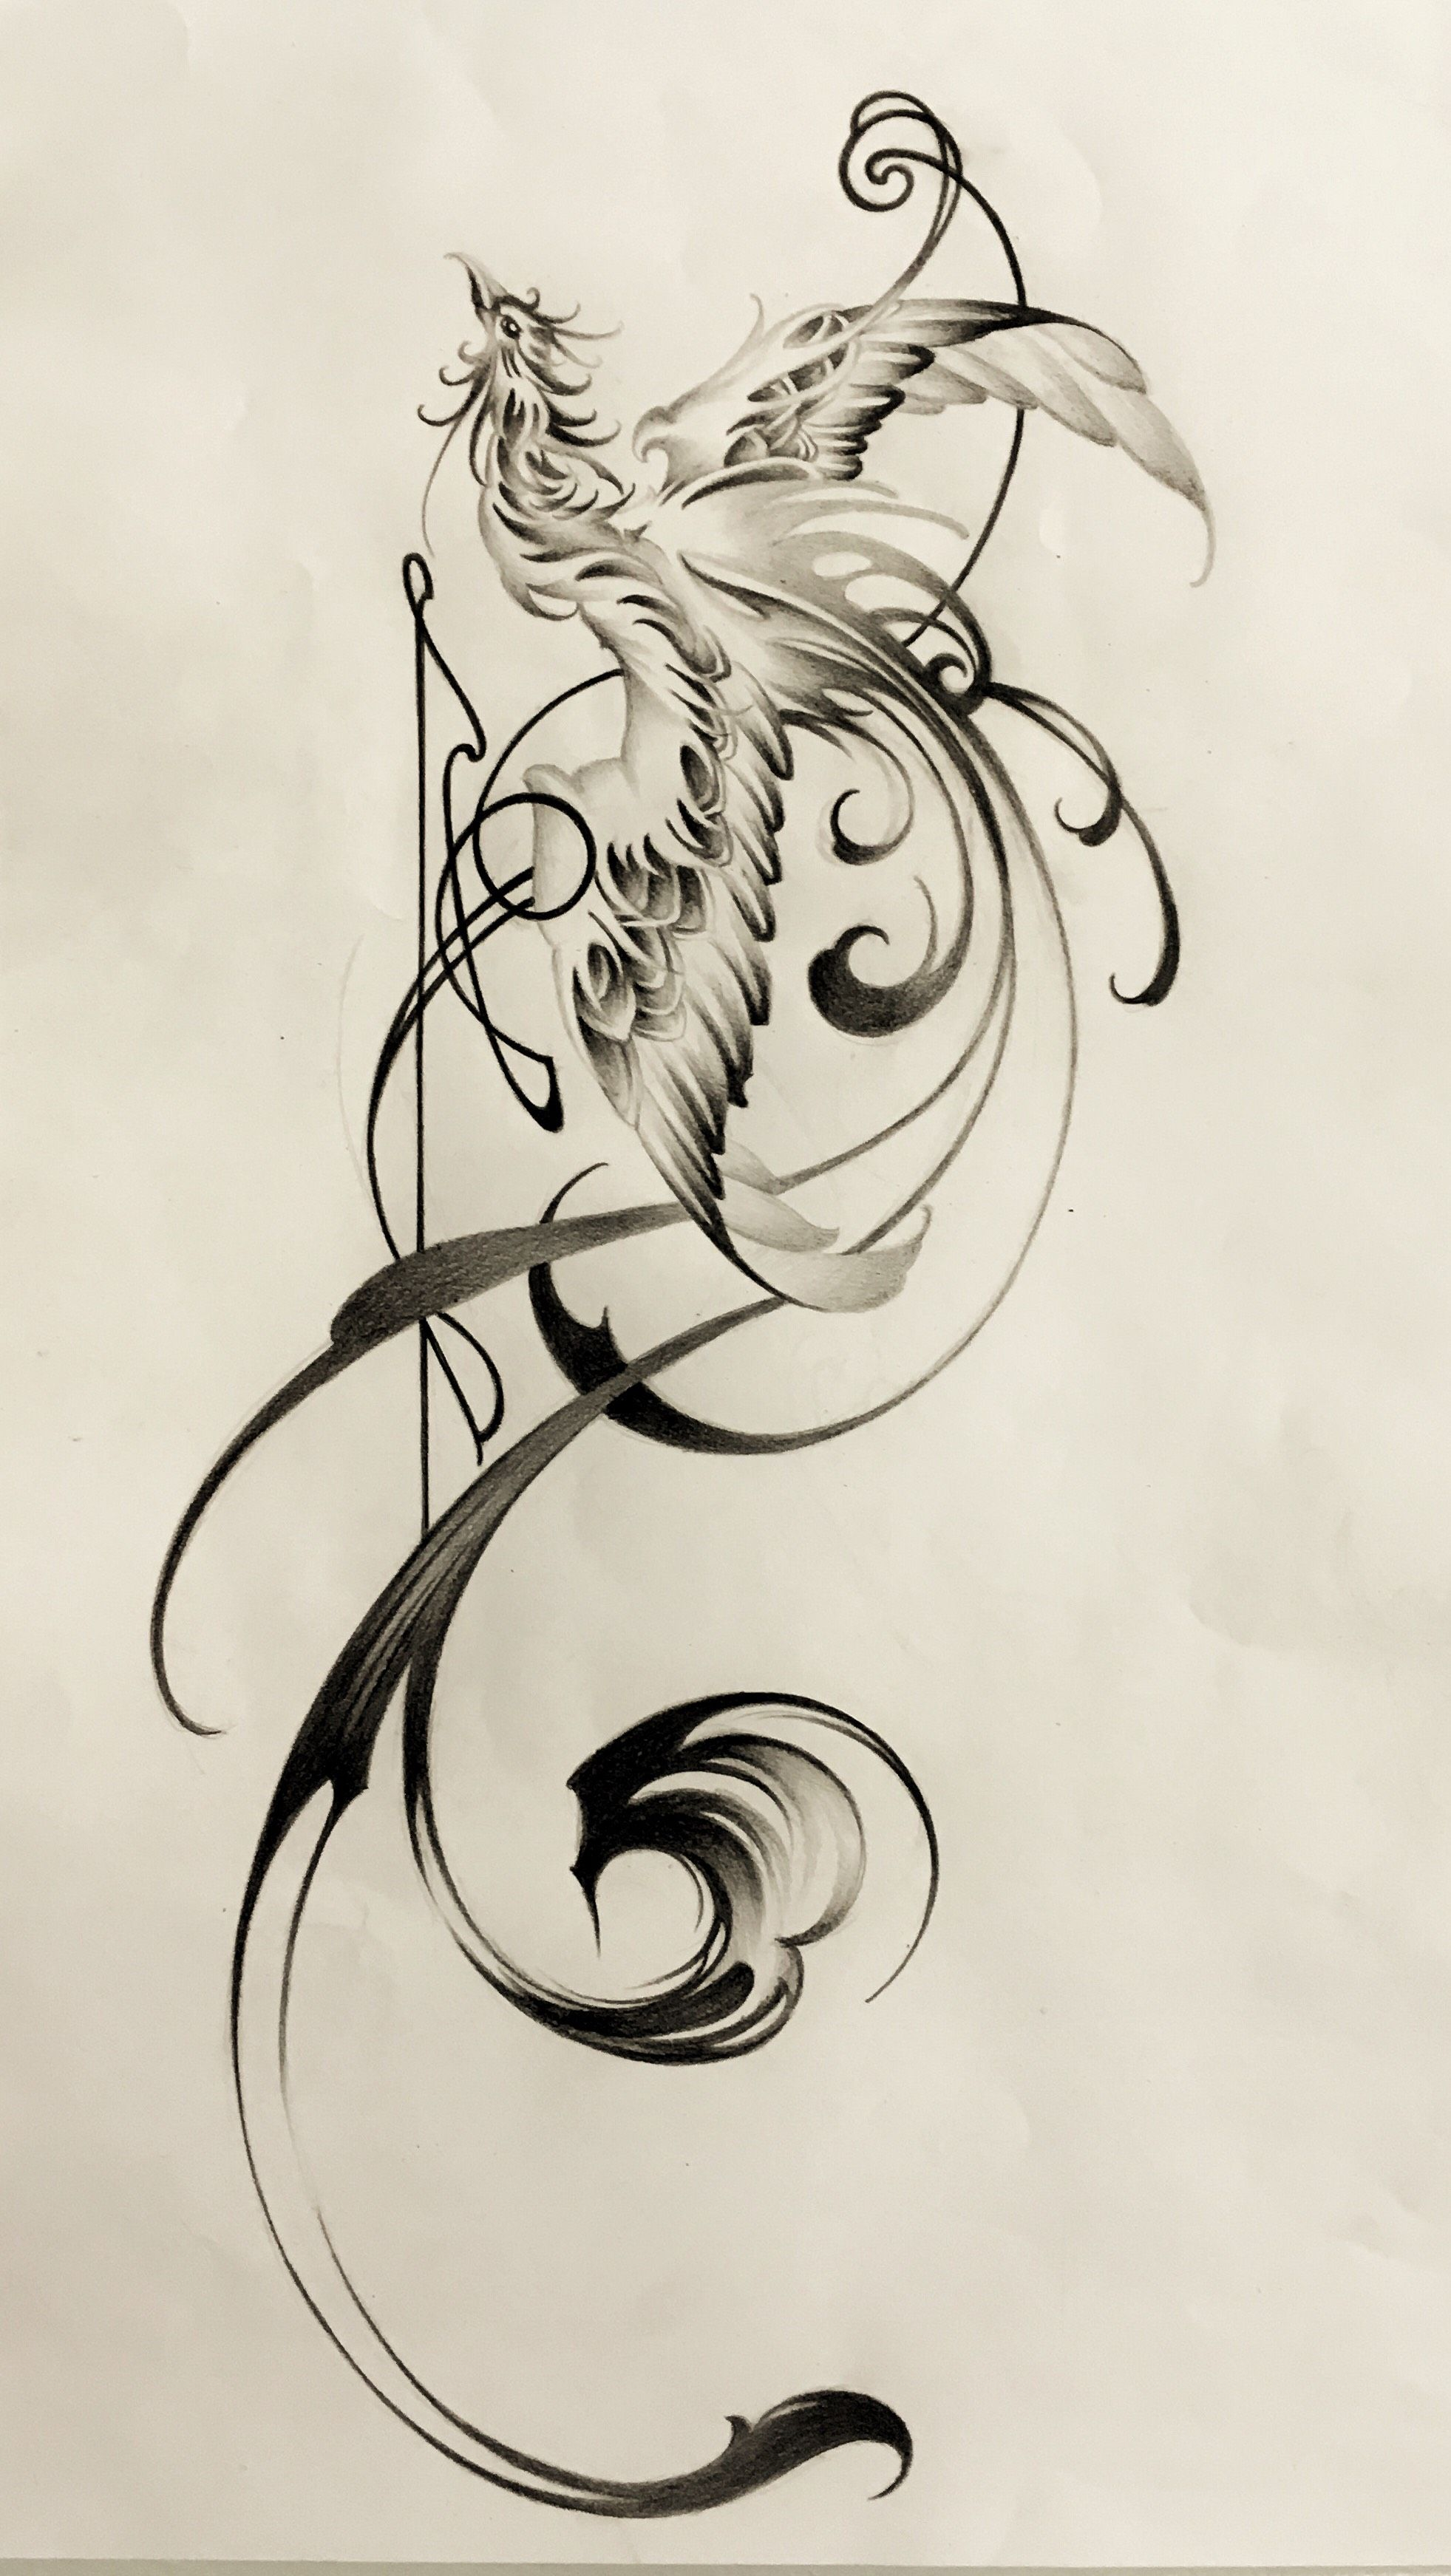 phoenix with brushstrokes tattoo design sumi tattoo artwork tattoo shop. Black Bedroom Furniture Sets. Home Design Ideas